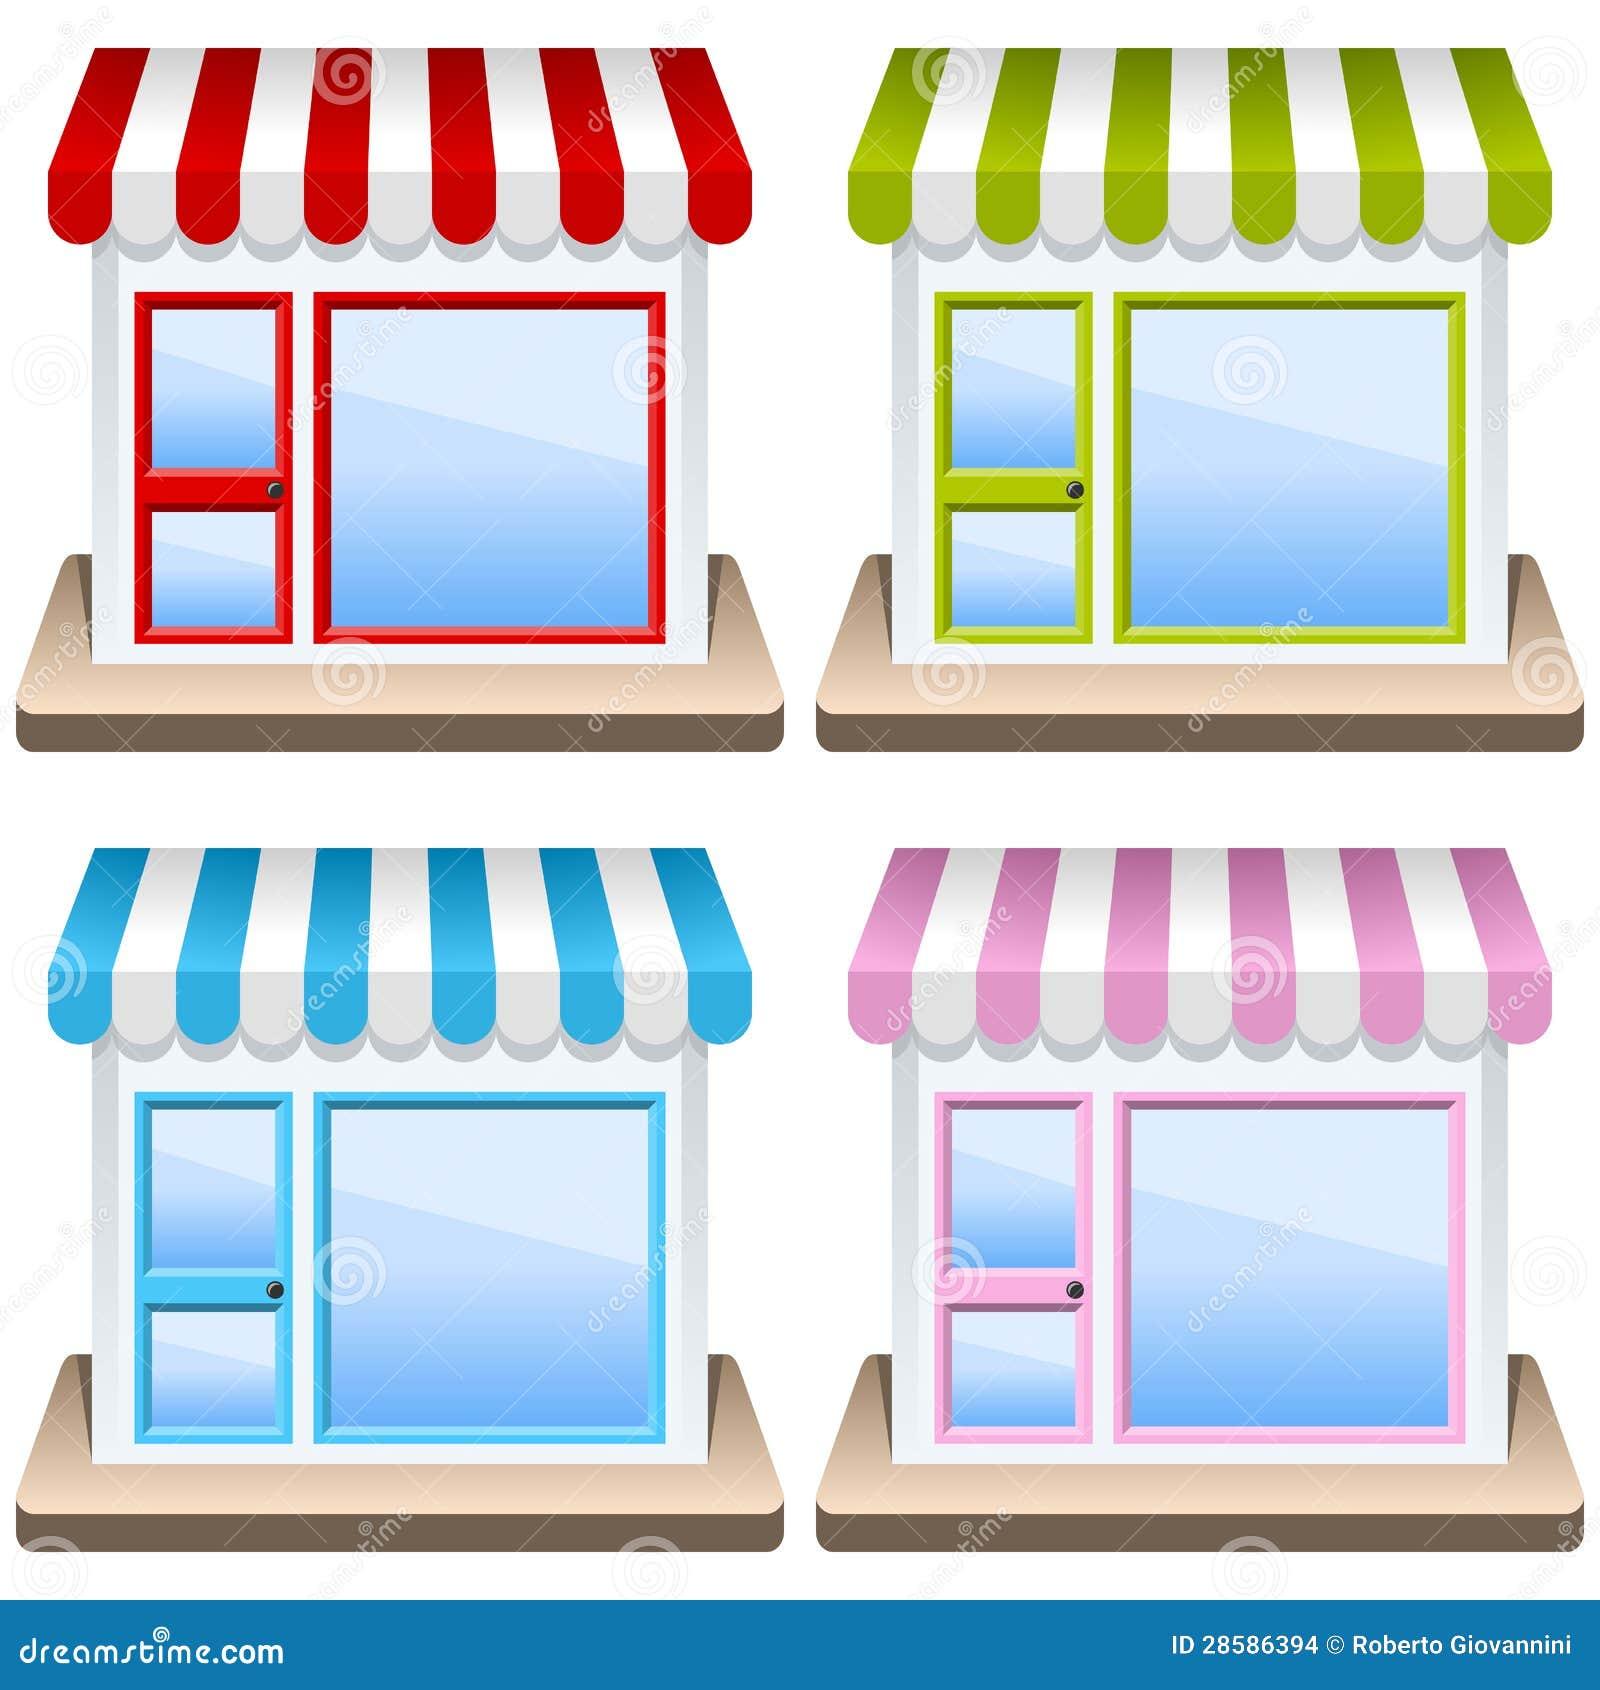 Generic Shop Building Icon Set Stock Images Image 28586394